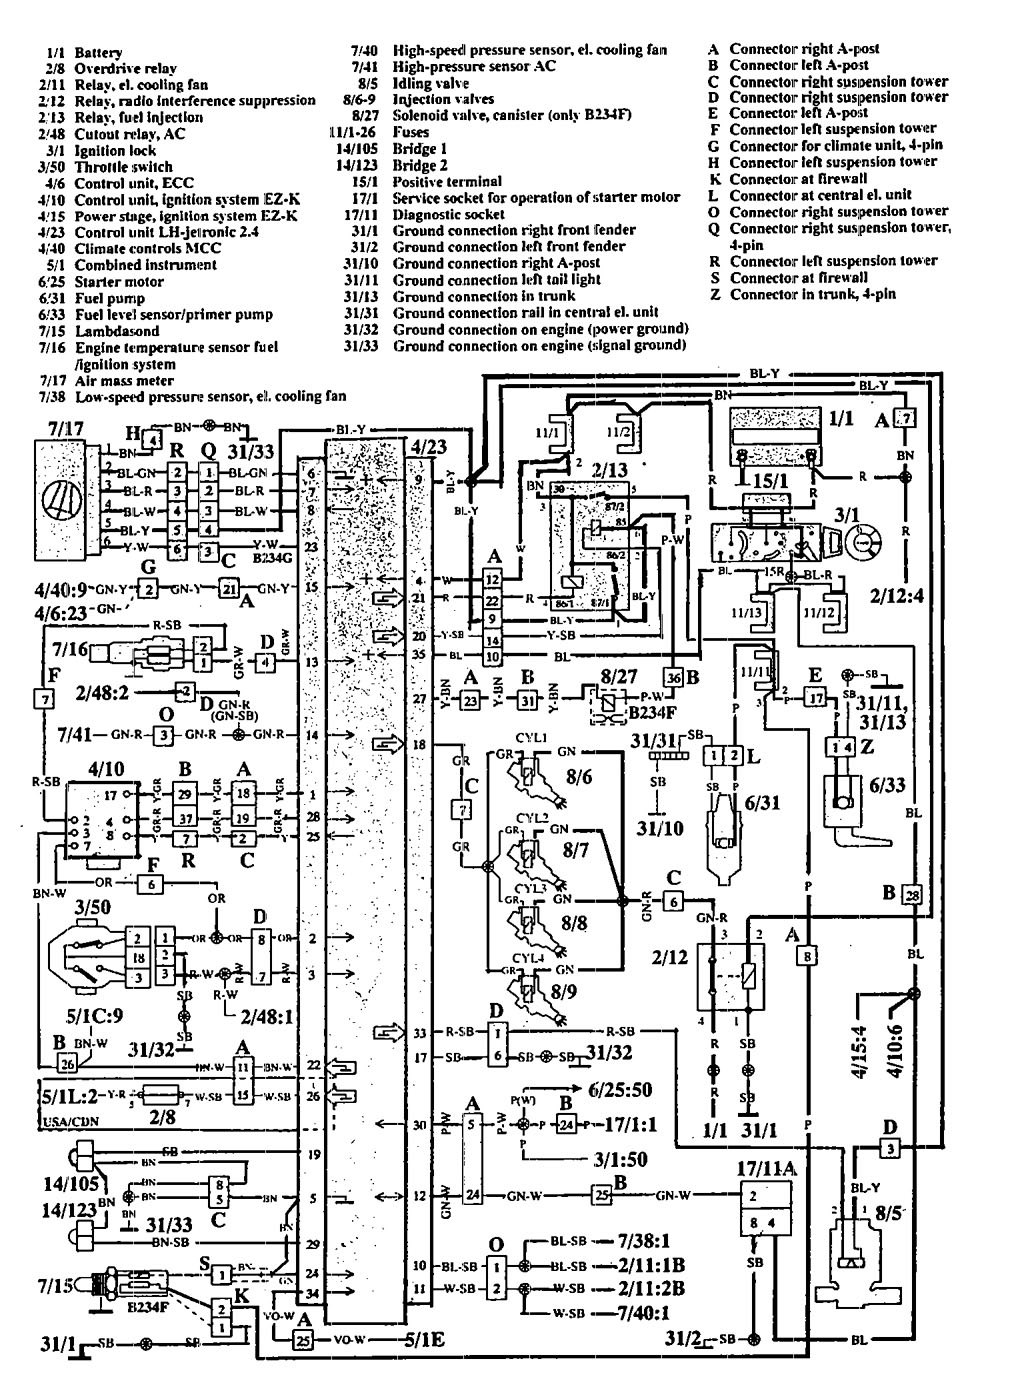 1995 Volvo 940 Radio Wiring | New Wiring Resources 2019 on